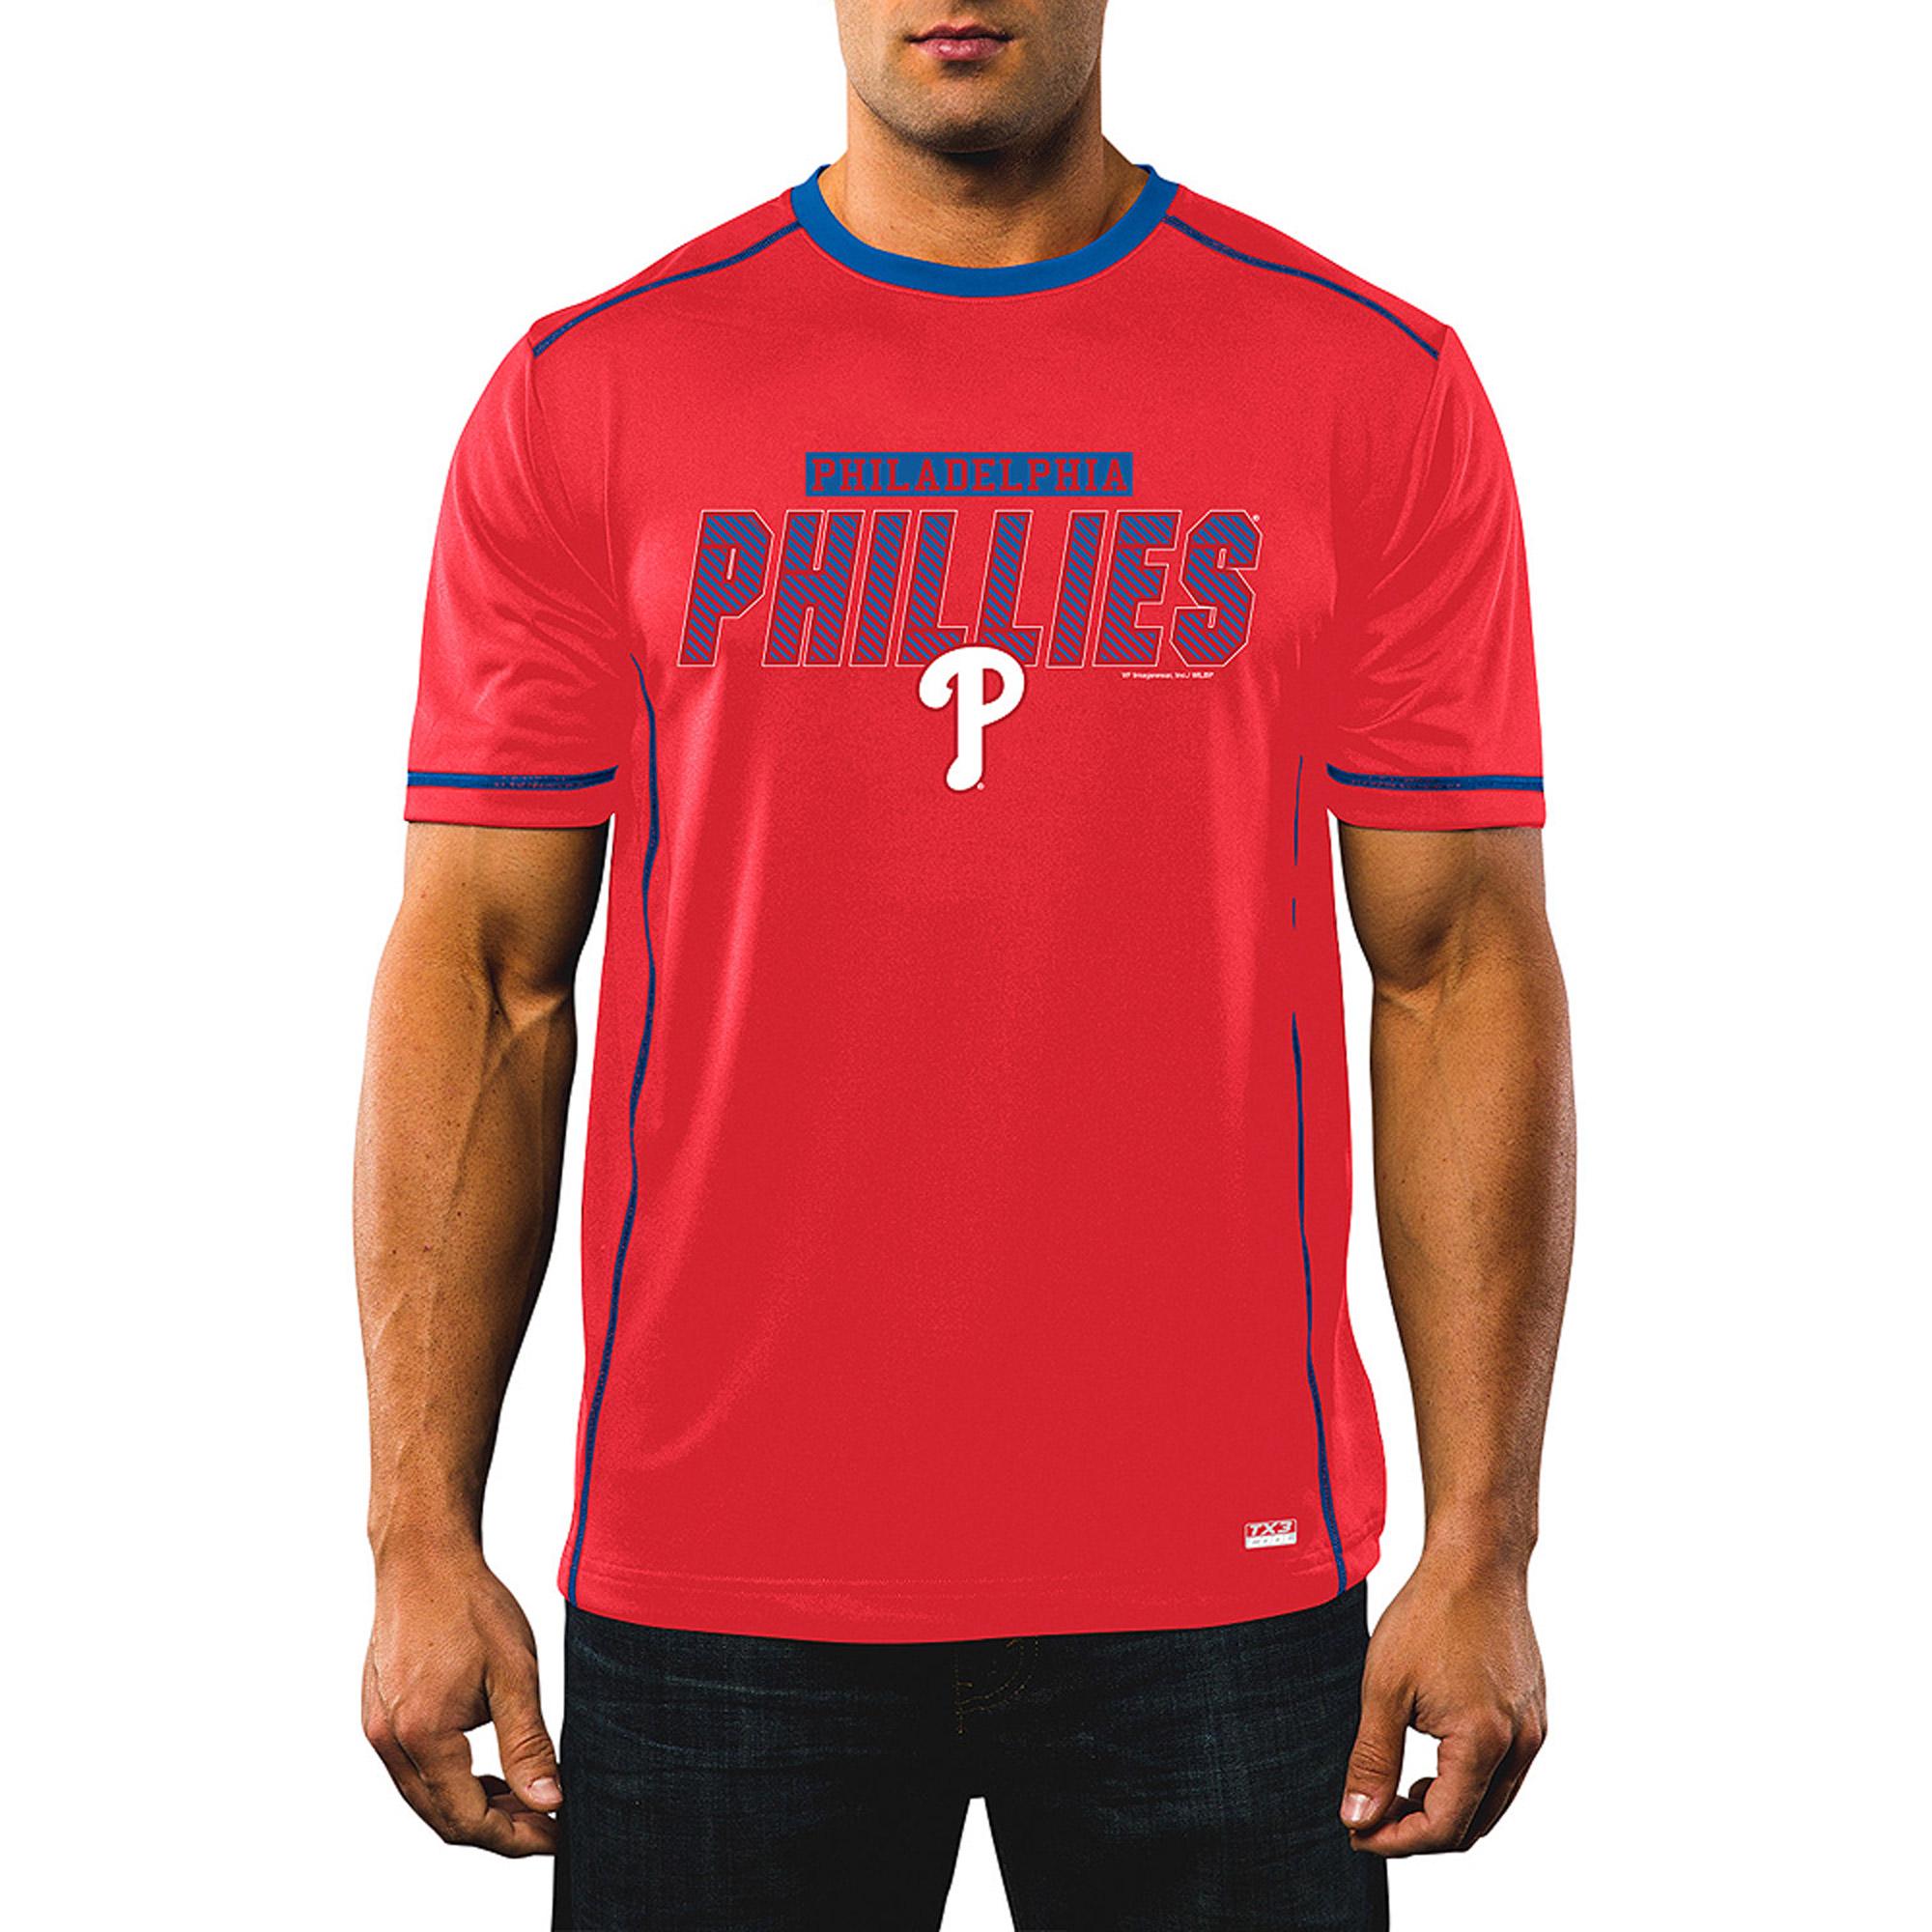 MLB Big Men's Philadelphia Phillies Synthetic Tee